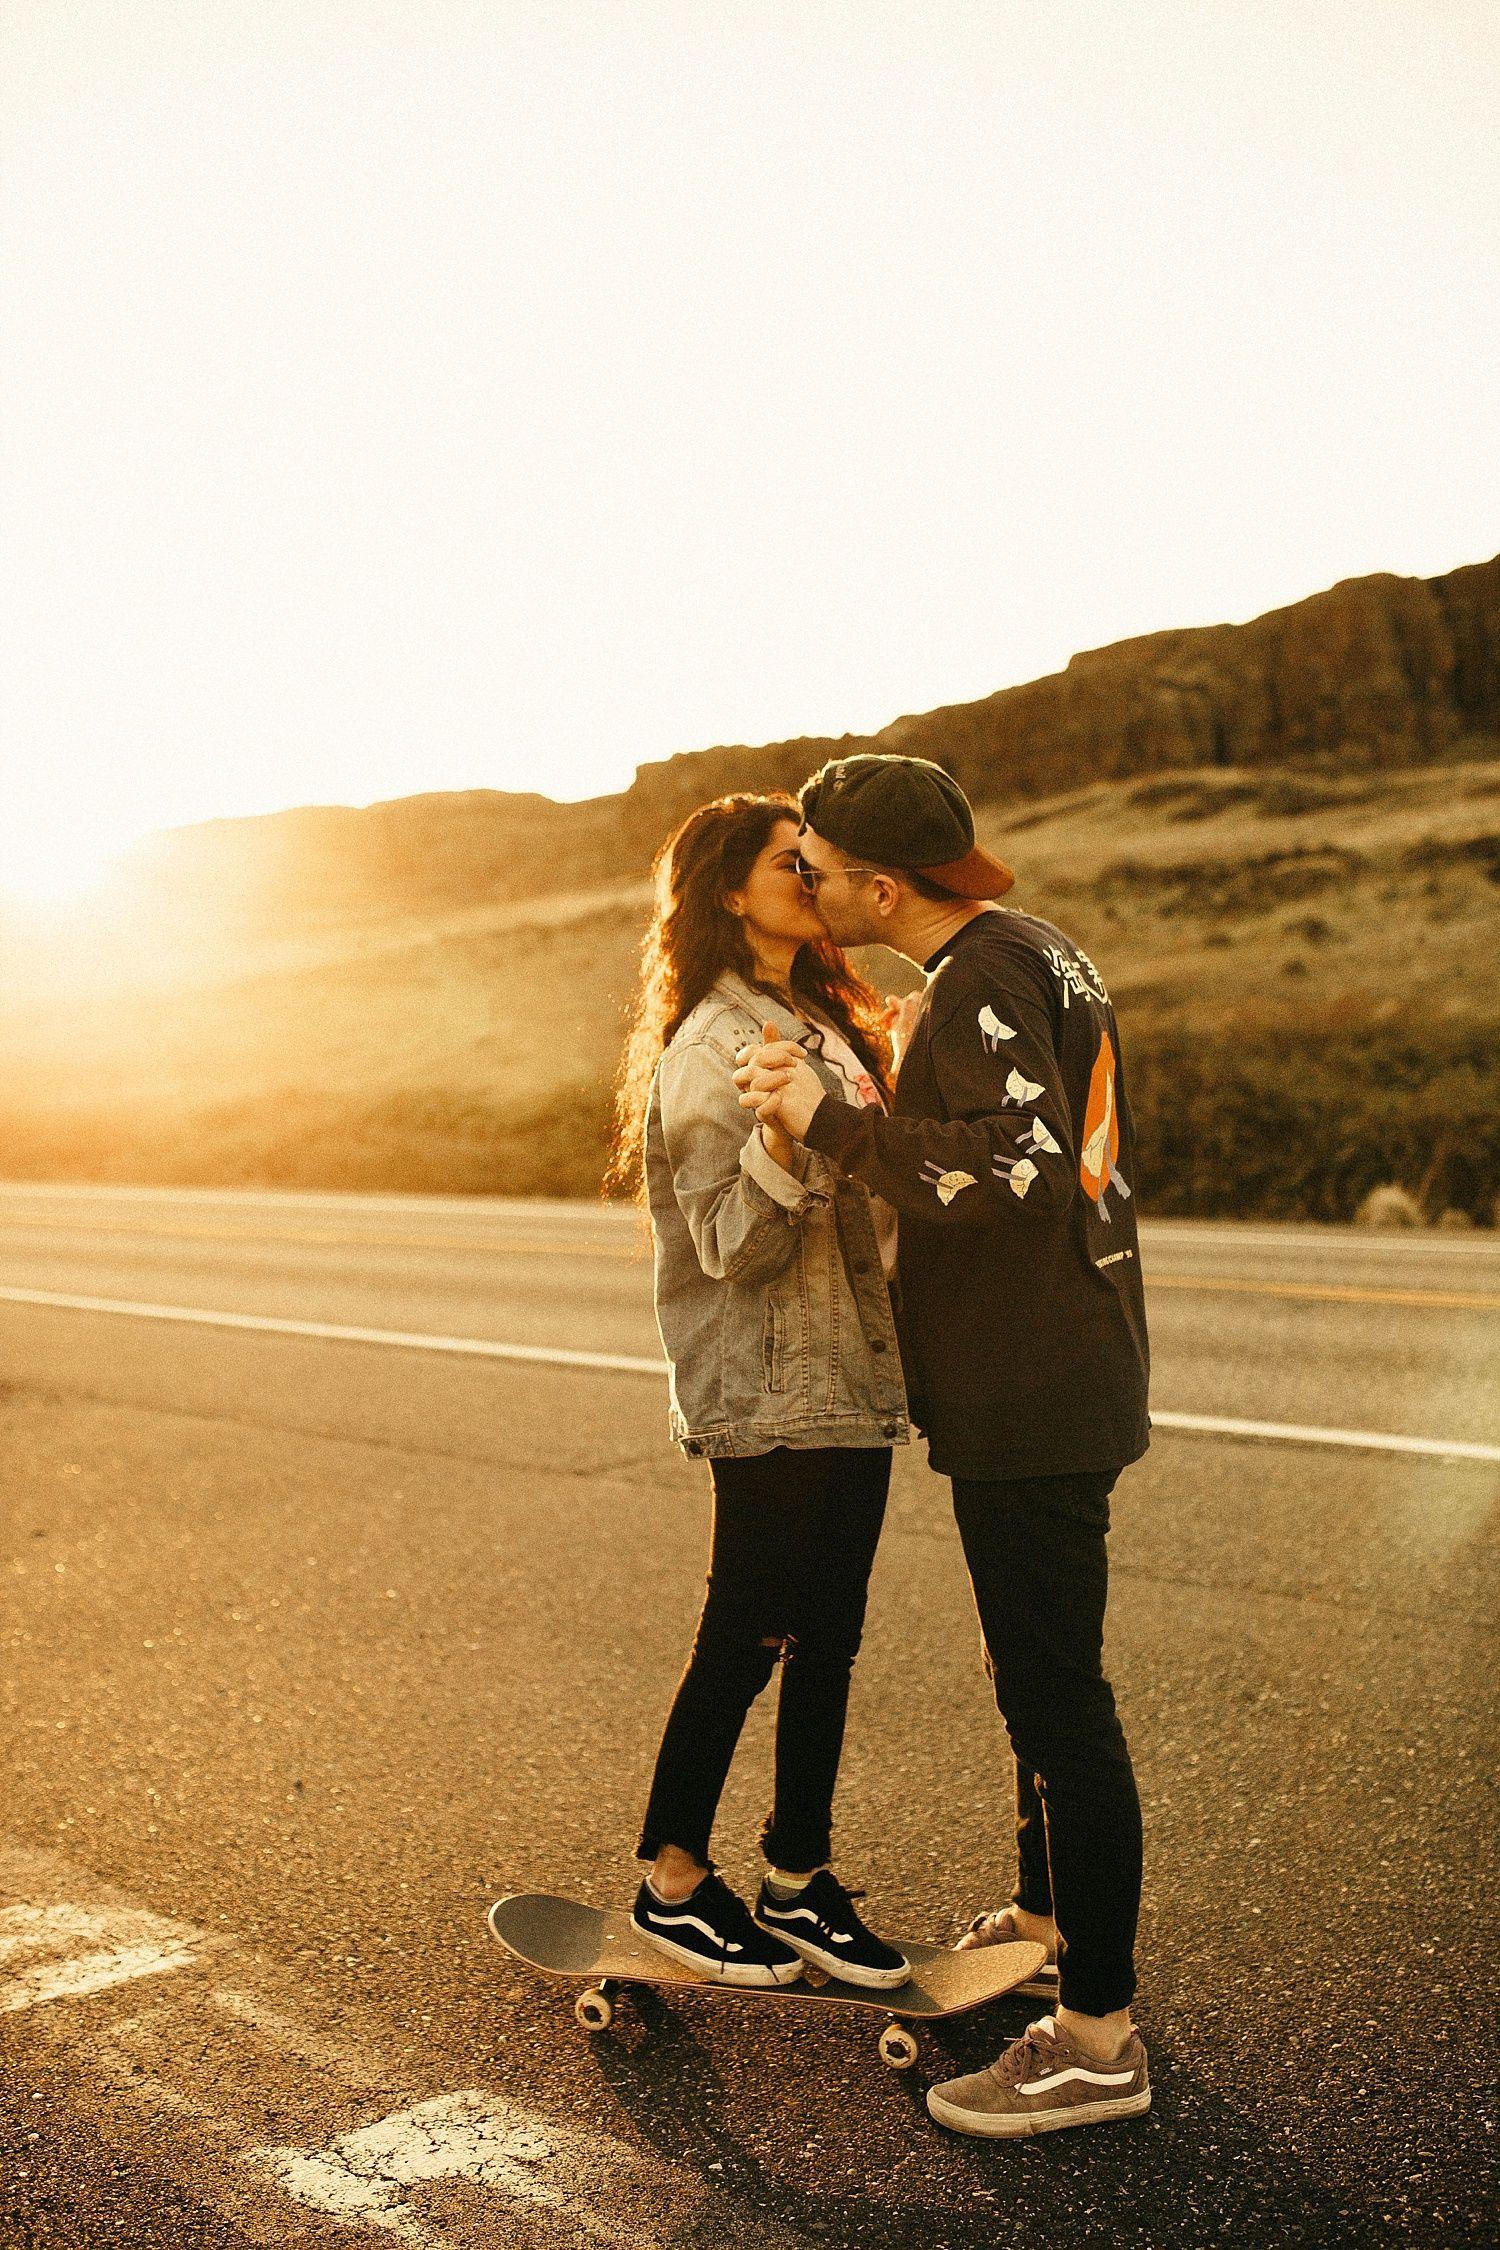 Skater Relationship Goals In 2020 Skateboarding Couples Skateboard Photography Couples